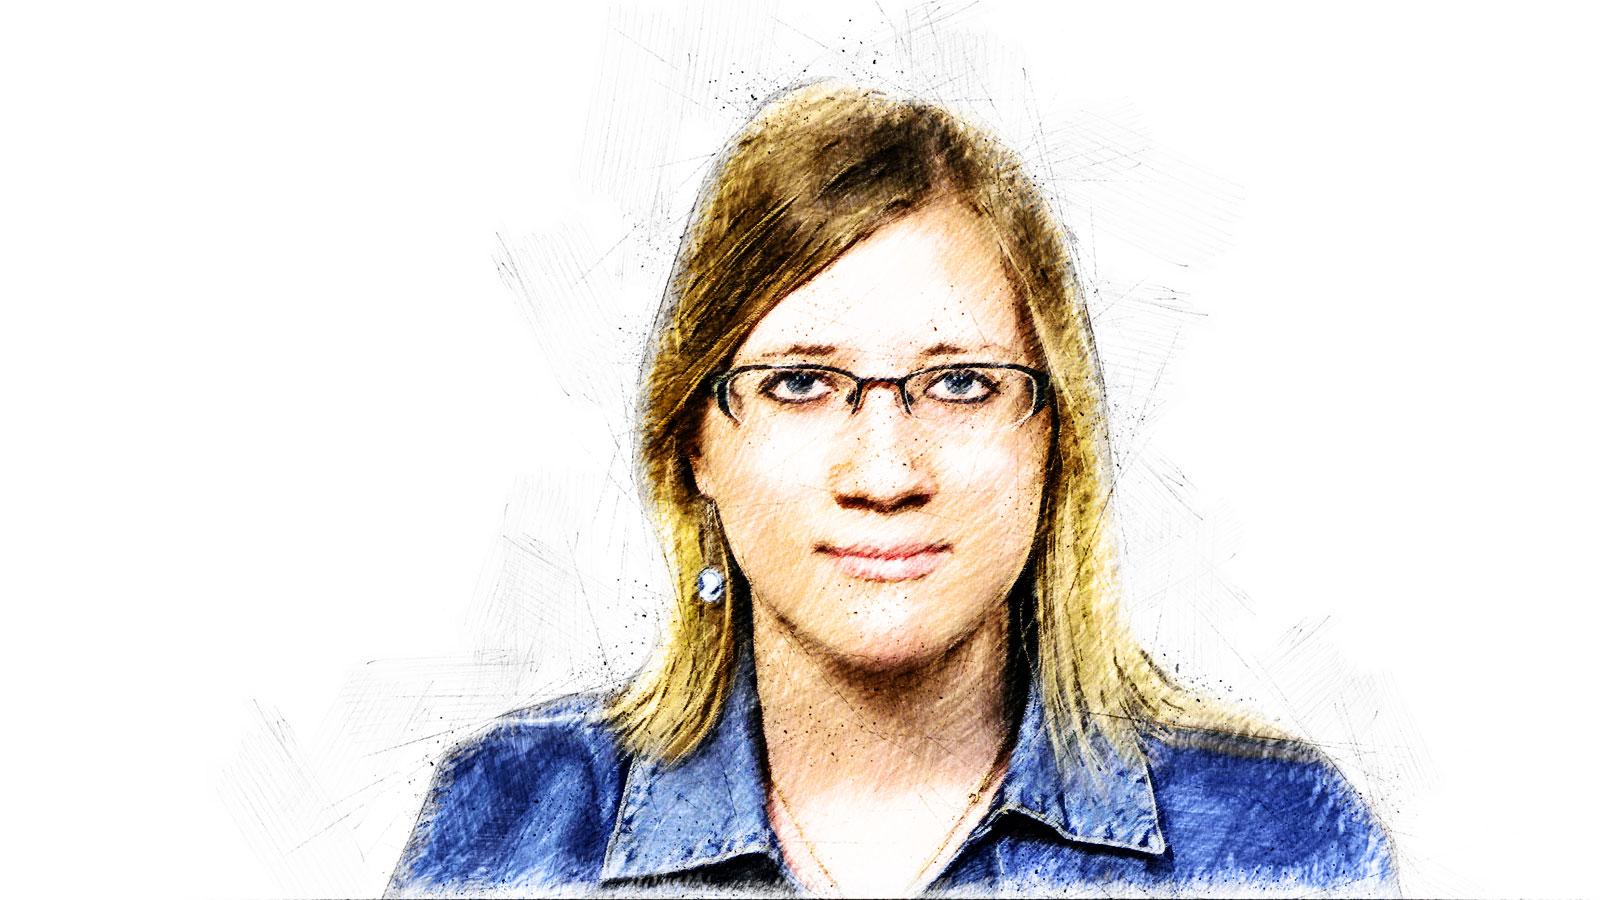 Ekaterina Venkina, Migazin, Autorin, Journalistin, Rassismus